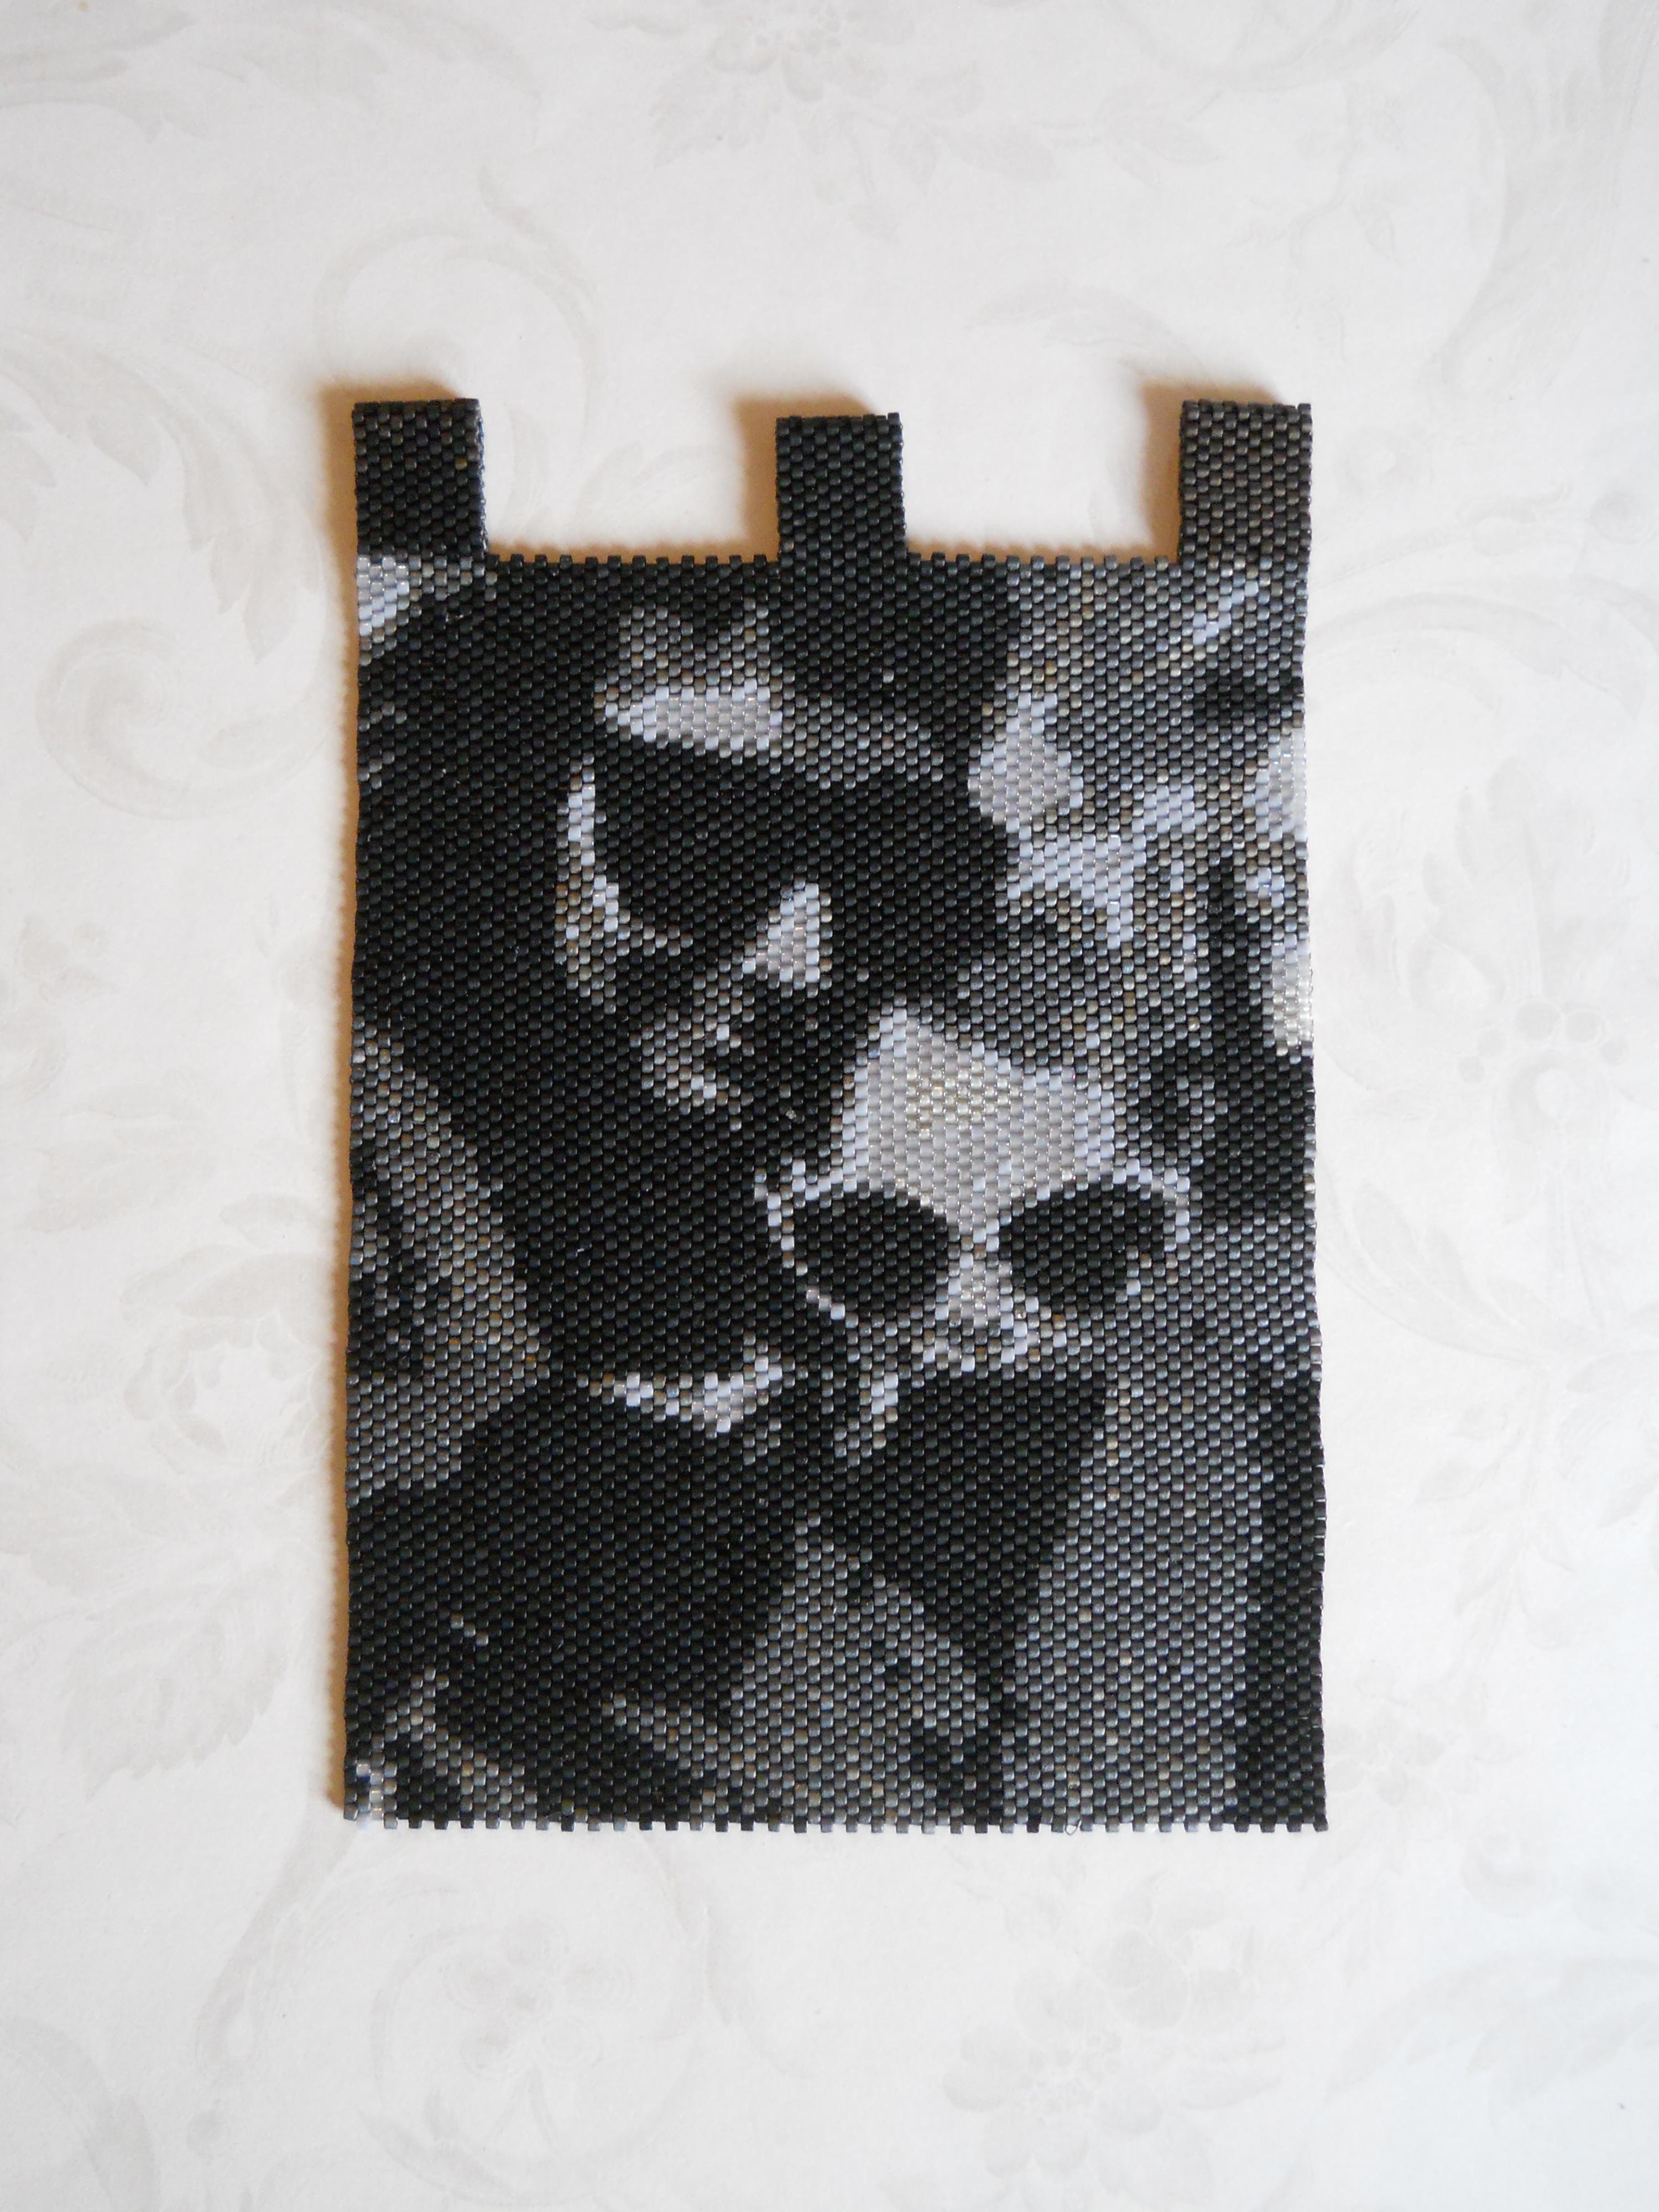 Photo Turned Into Peyote Stitch Wall Hanging